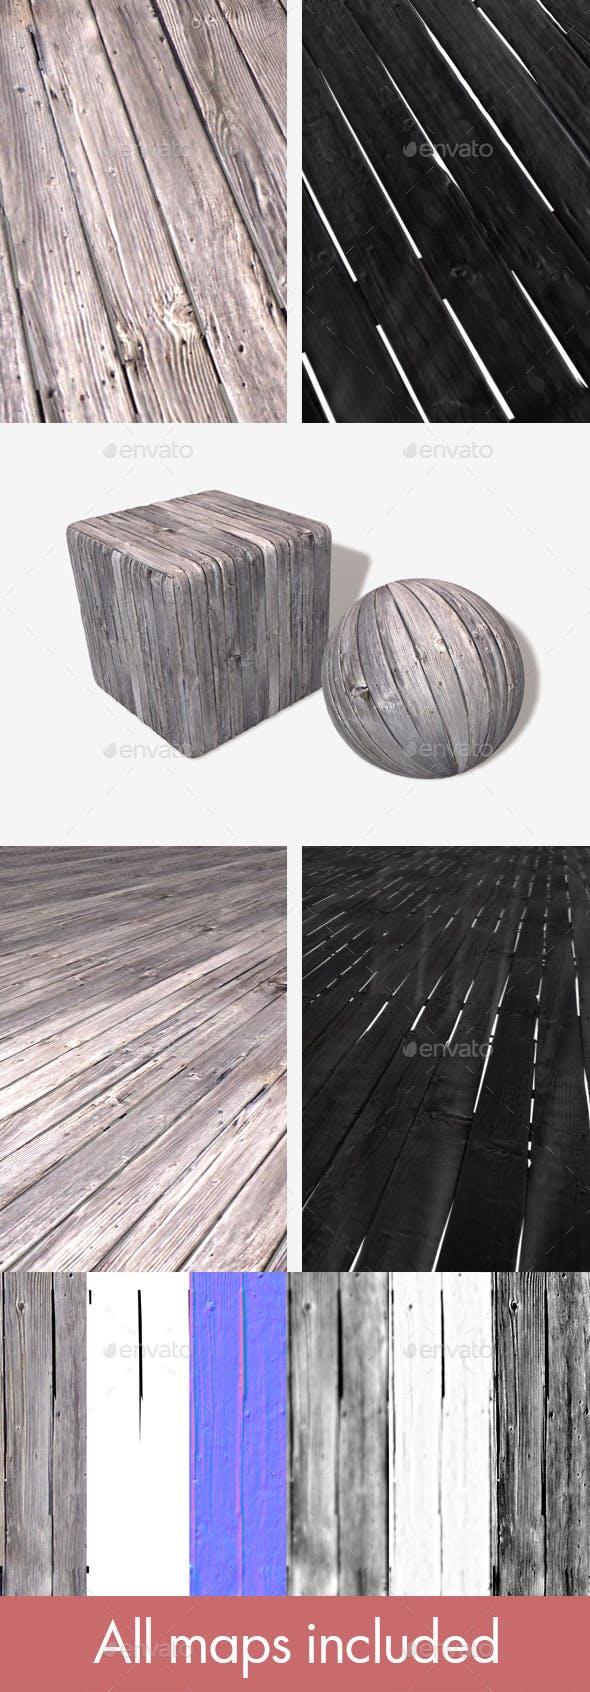 Broken Wooden Planks Seamless Texture - 3DOcean Item for Sale